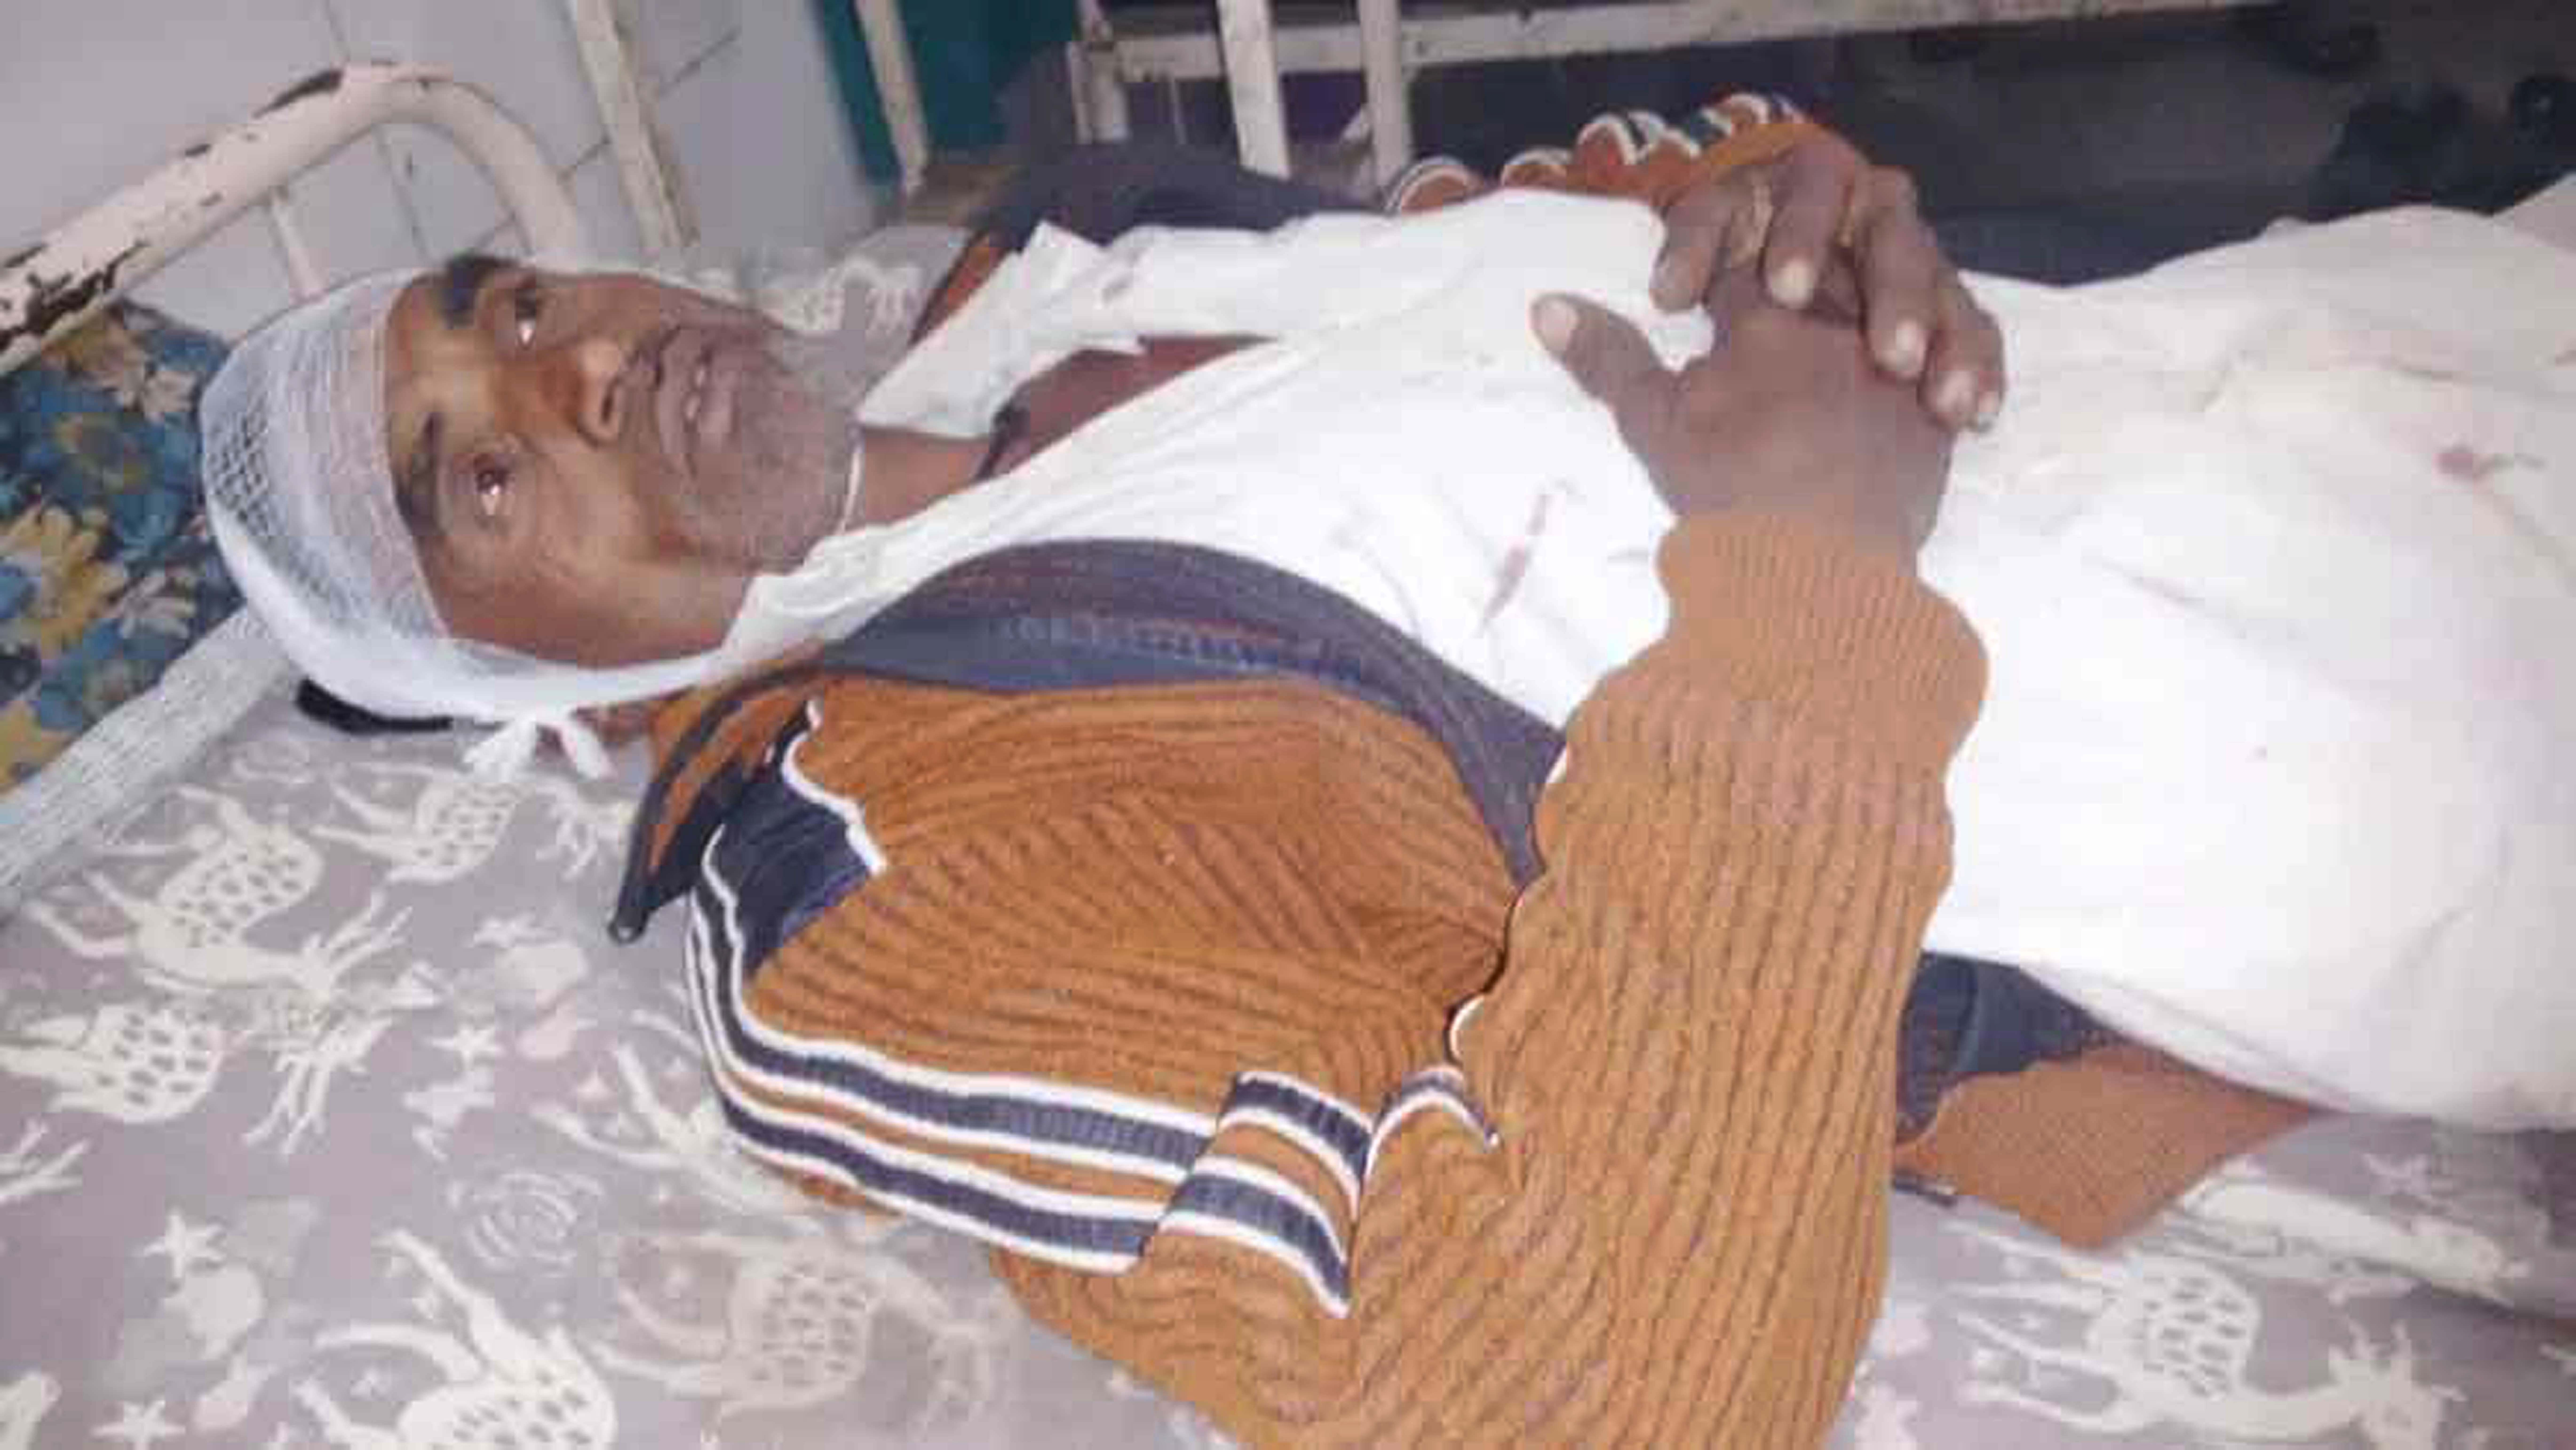 Leader of farmers group KSS, Sajje Chandravanshi, in hospital after the attack in November 2015. Courtesy KSS